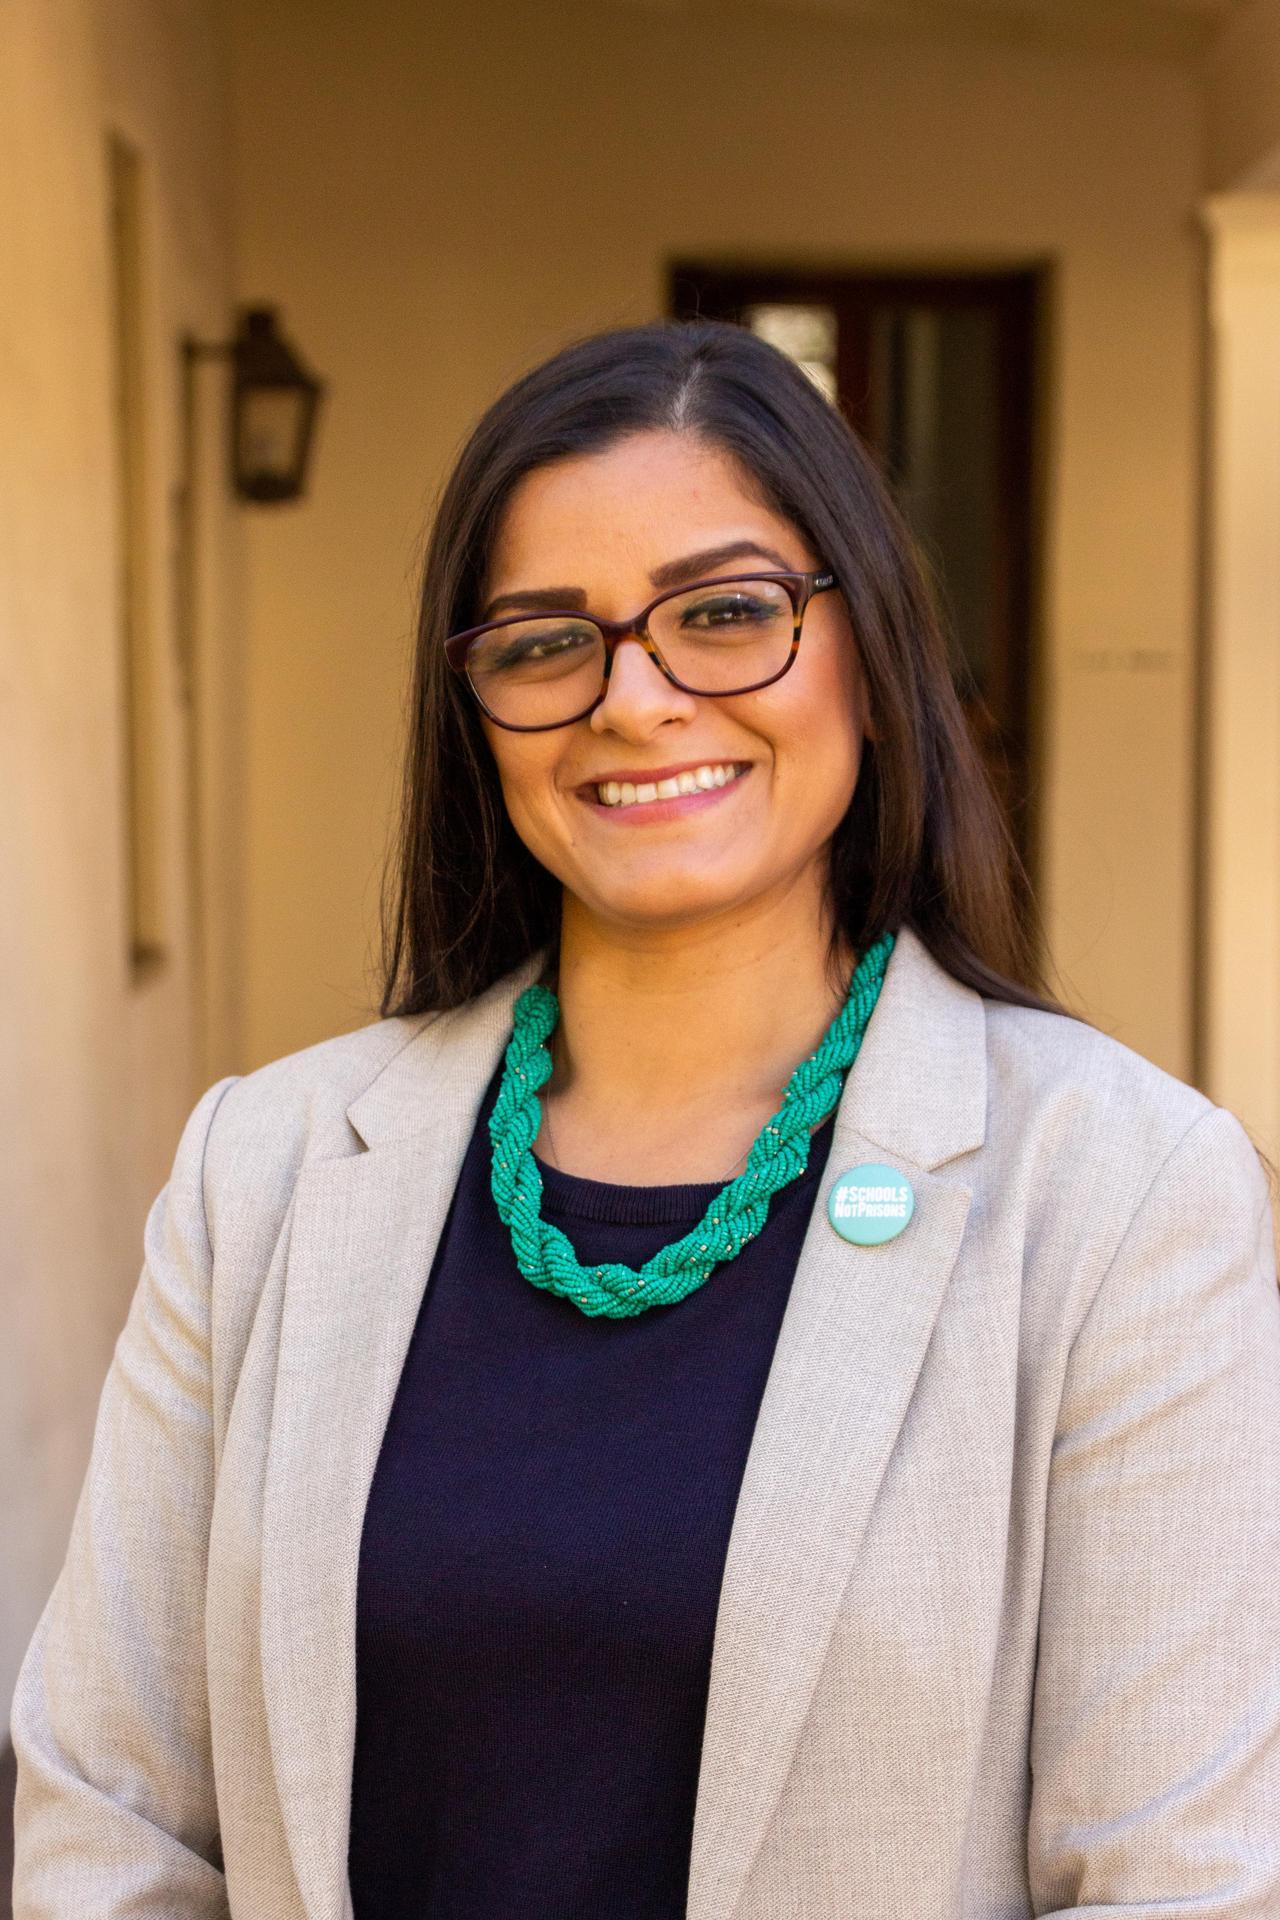 Board Member Ms. Miramontes